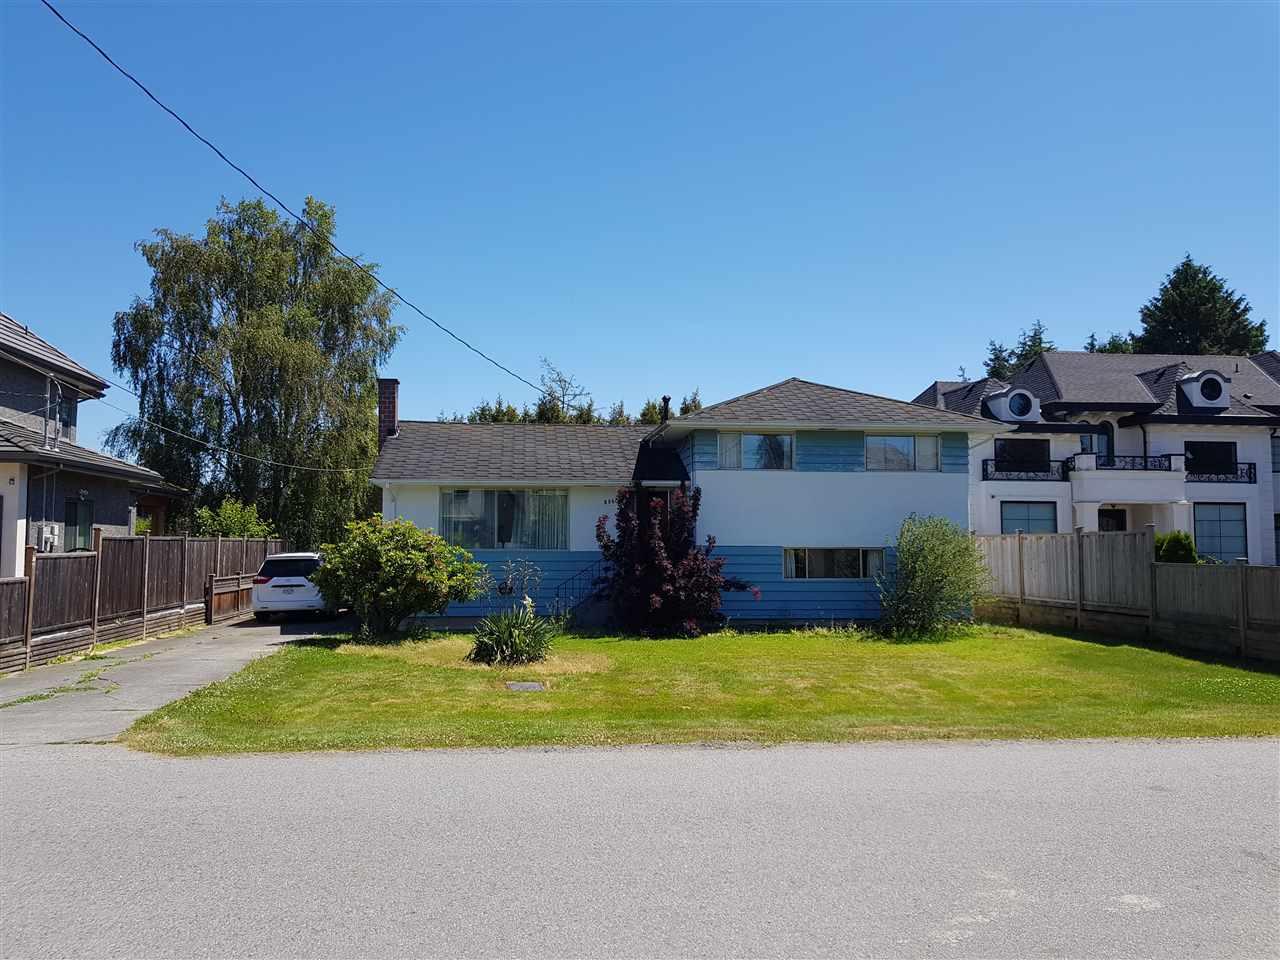 Detached at 8260 ELSMORE ROAD, Richmond, British Columbia. Image 1